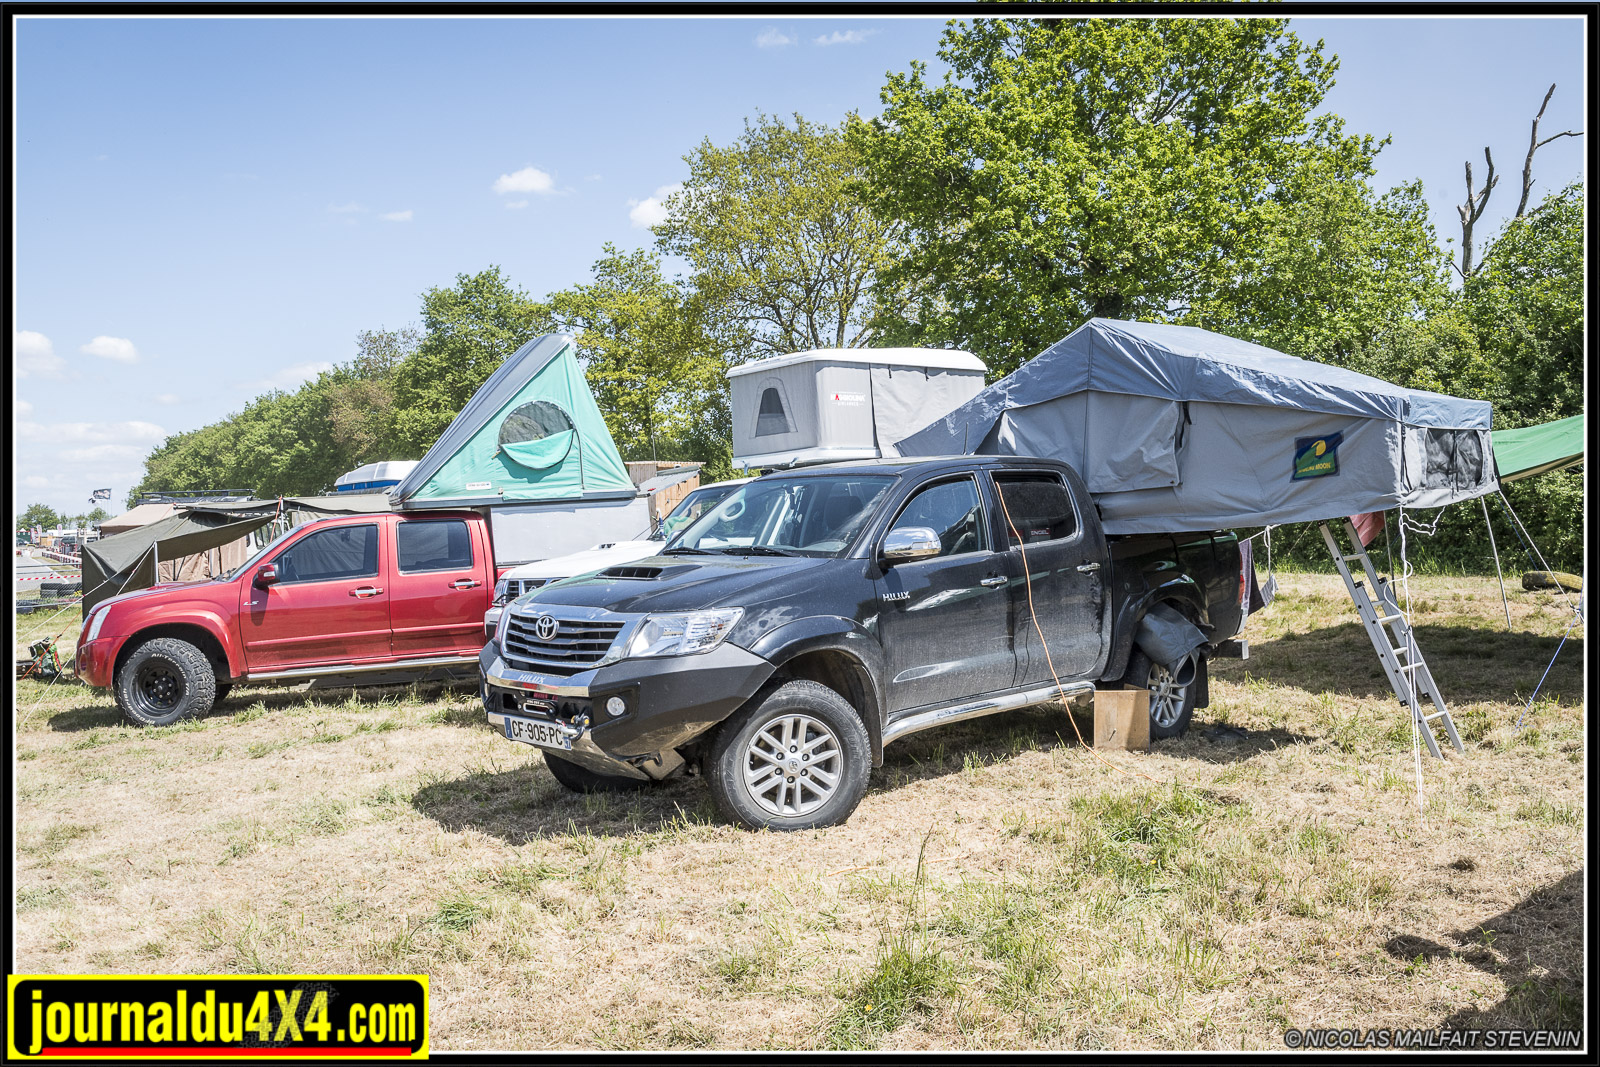 salon-vehicules-aventure-2017-9174.jpg